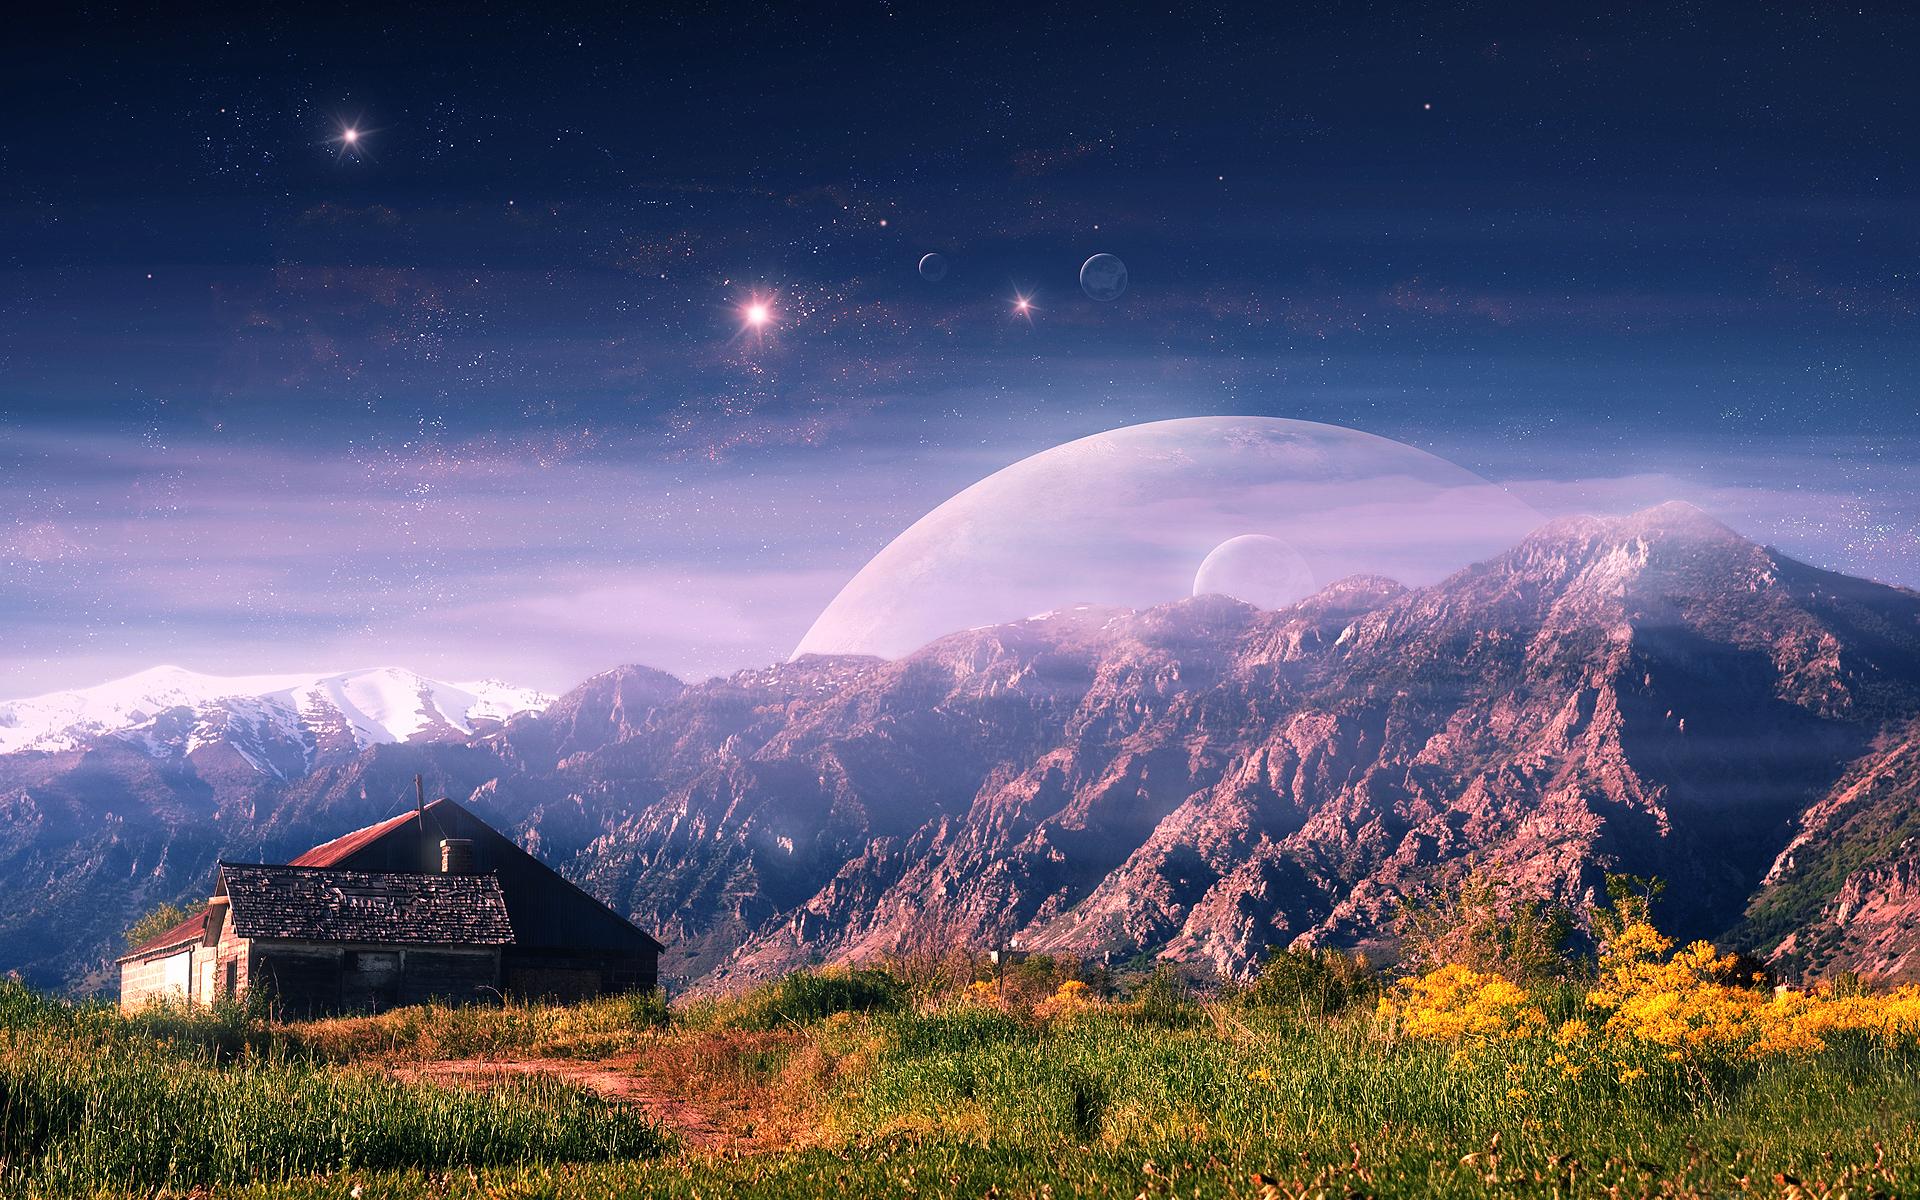 дом, холм, небо